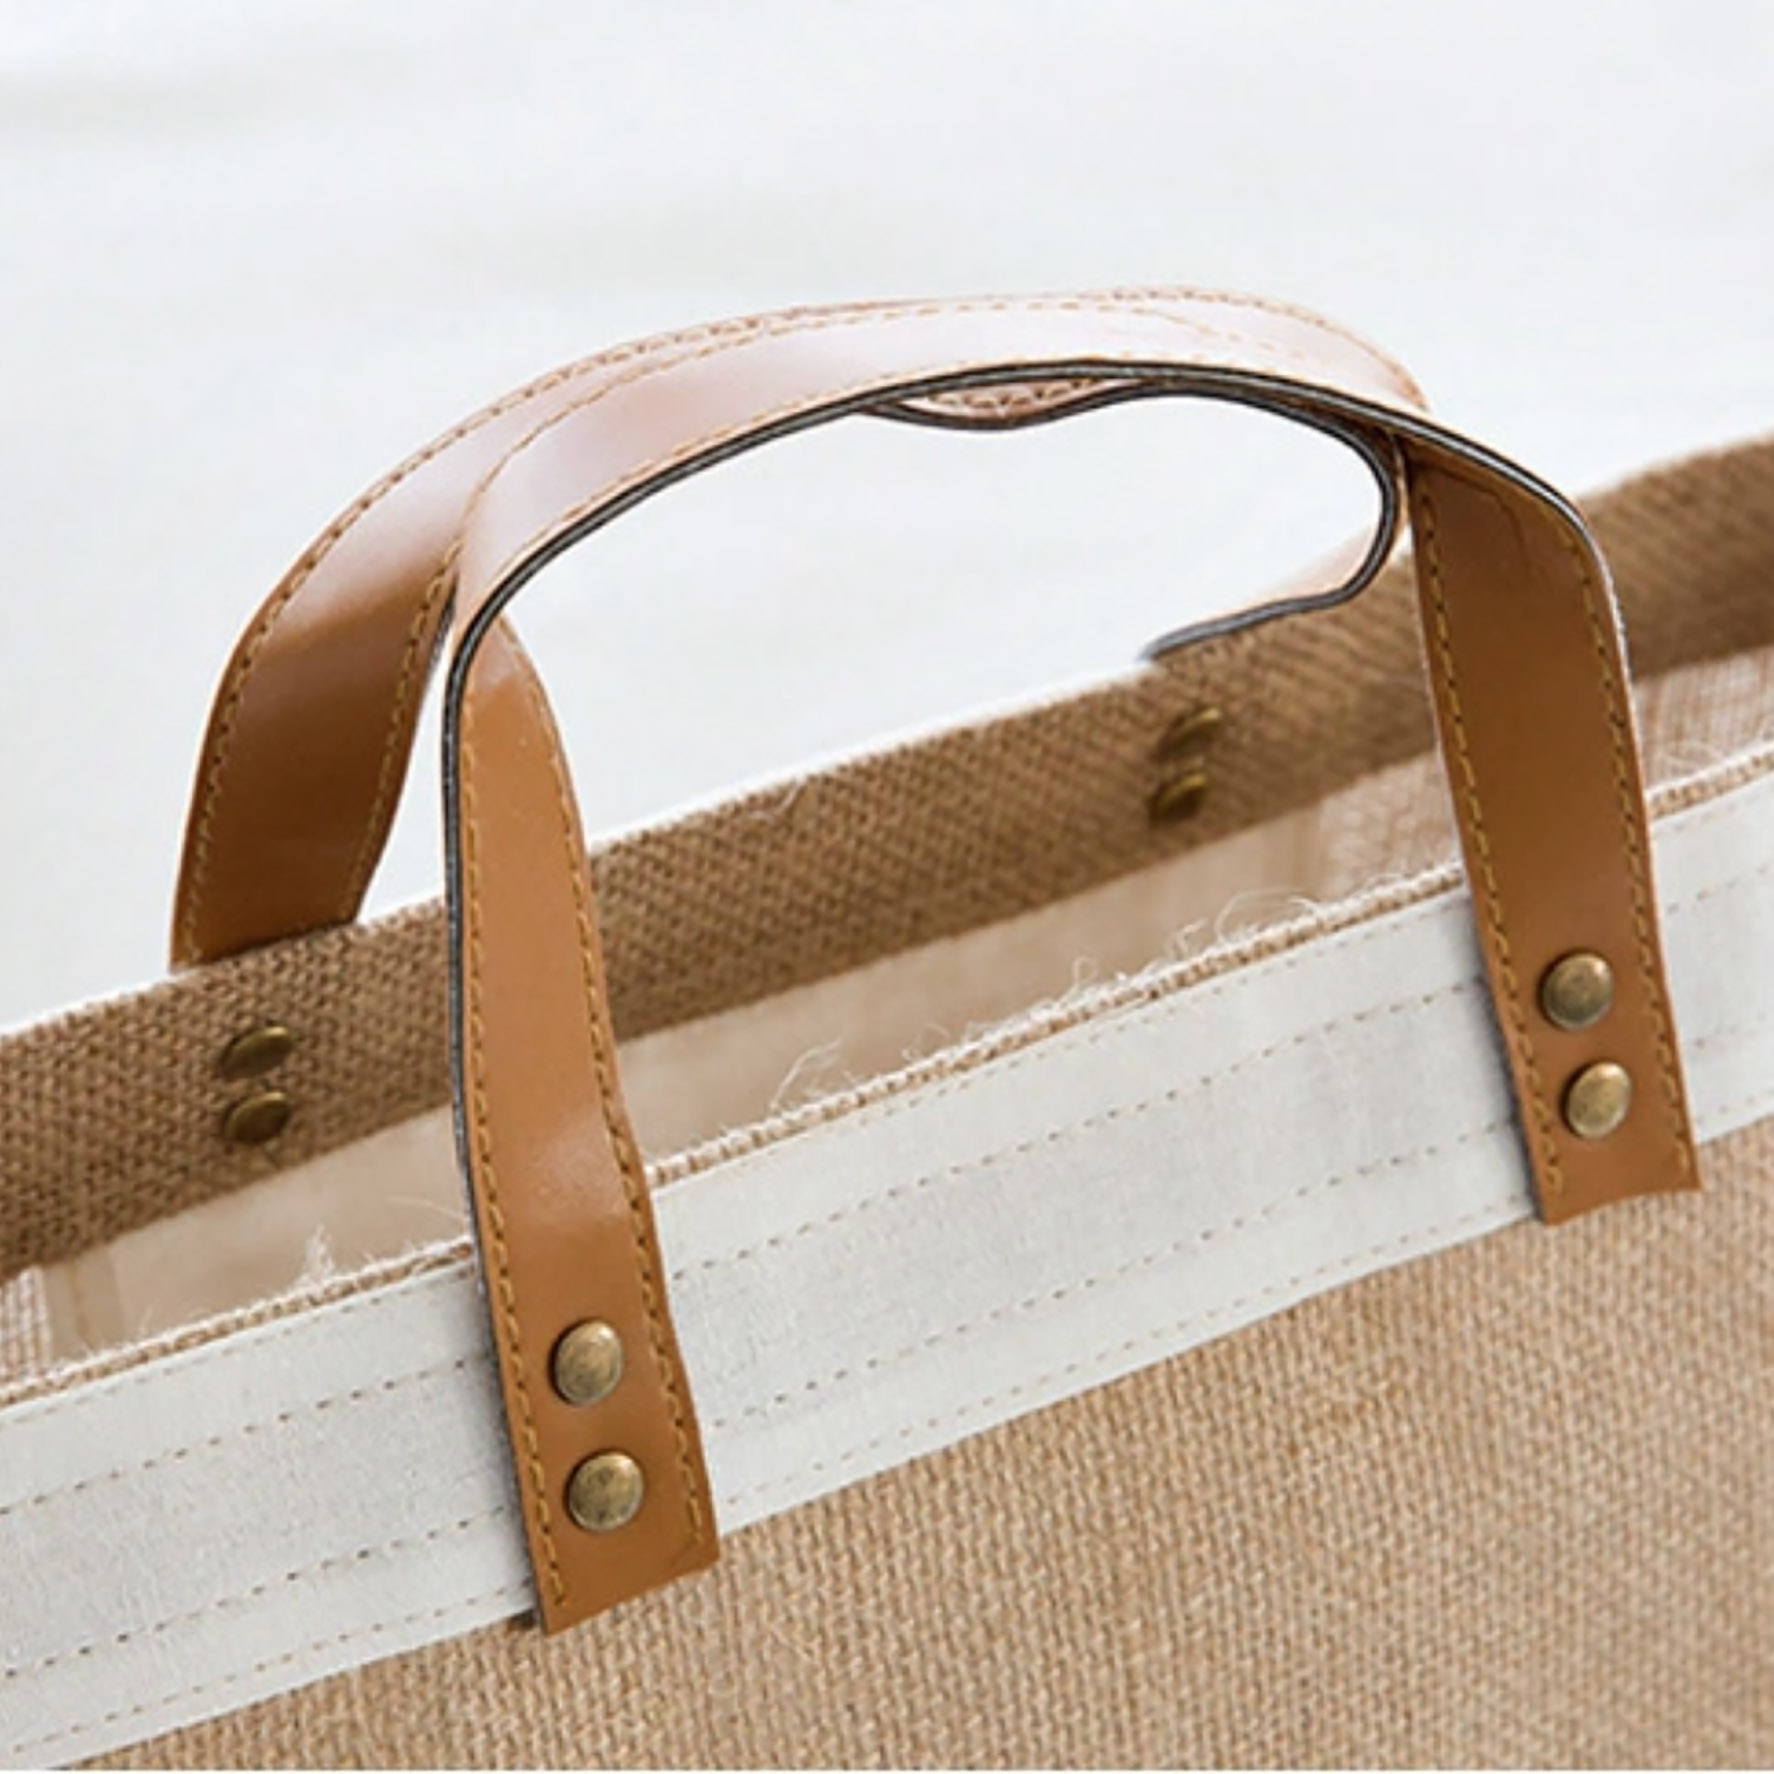 Leather handle of jute bag